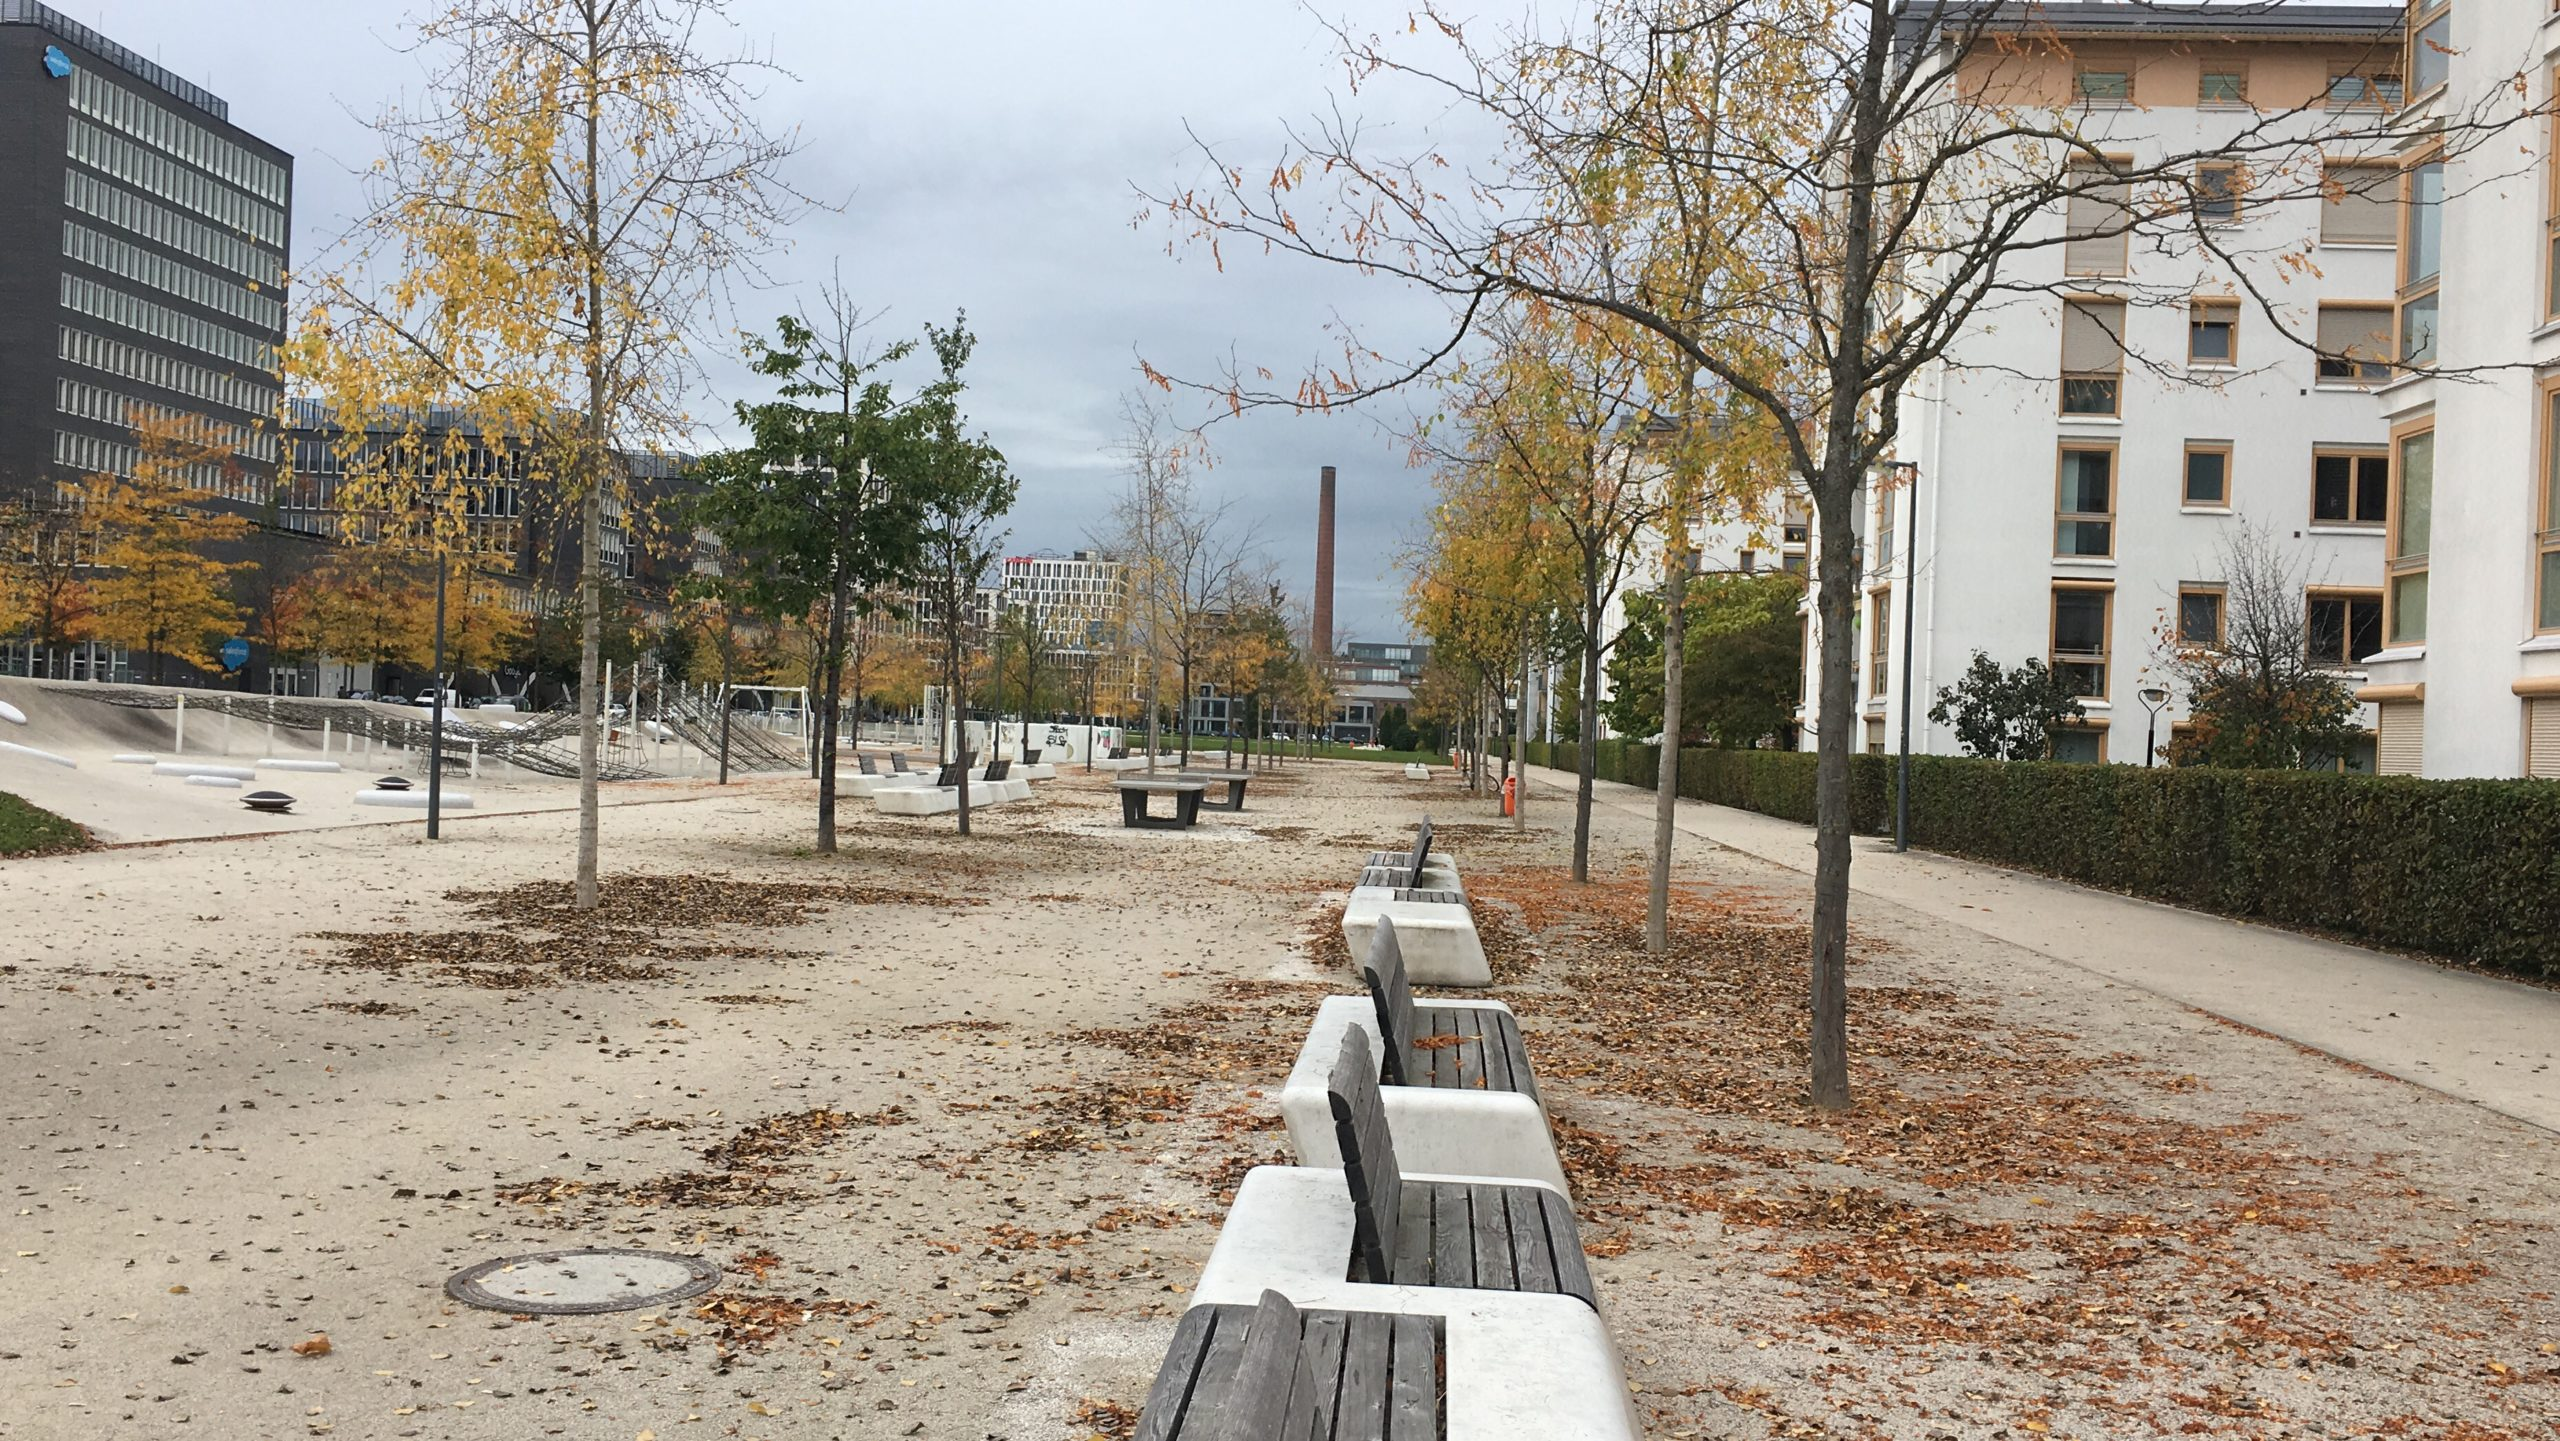 Neubaugebiet Arnulfpark 2017